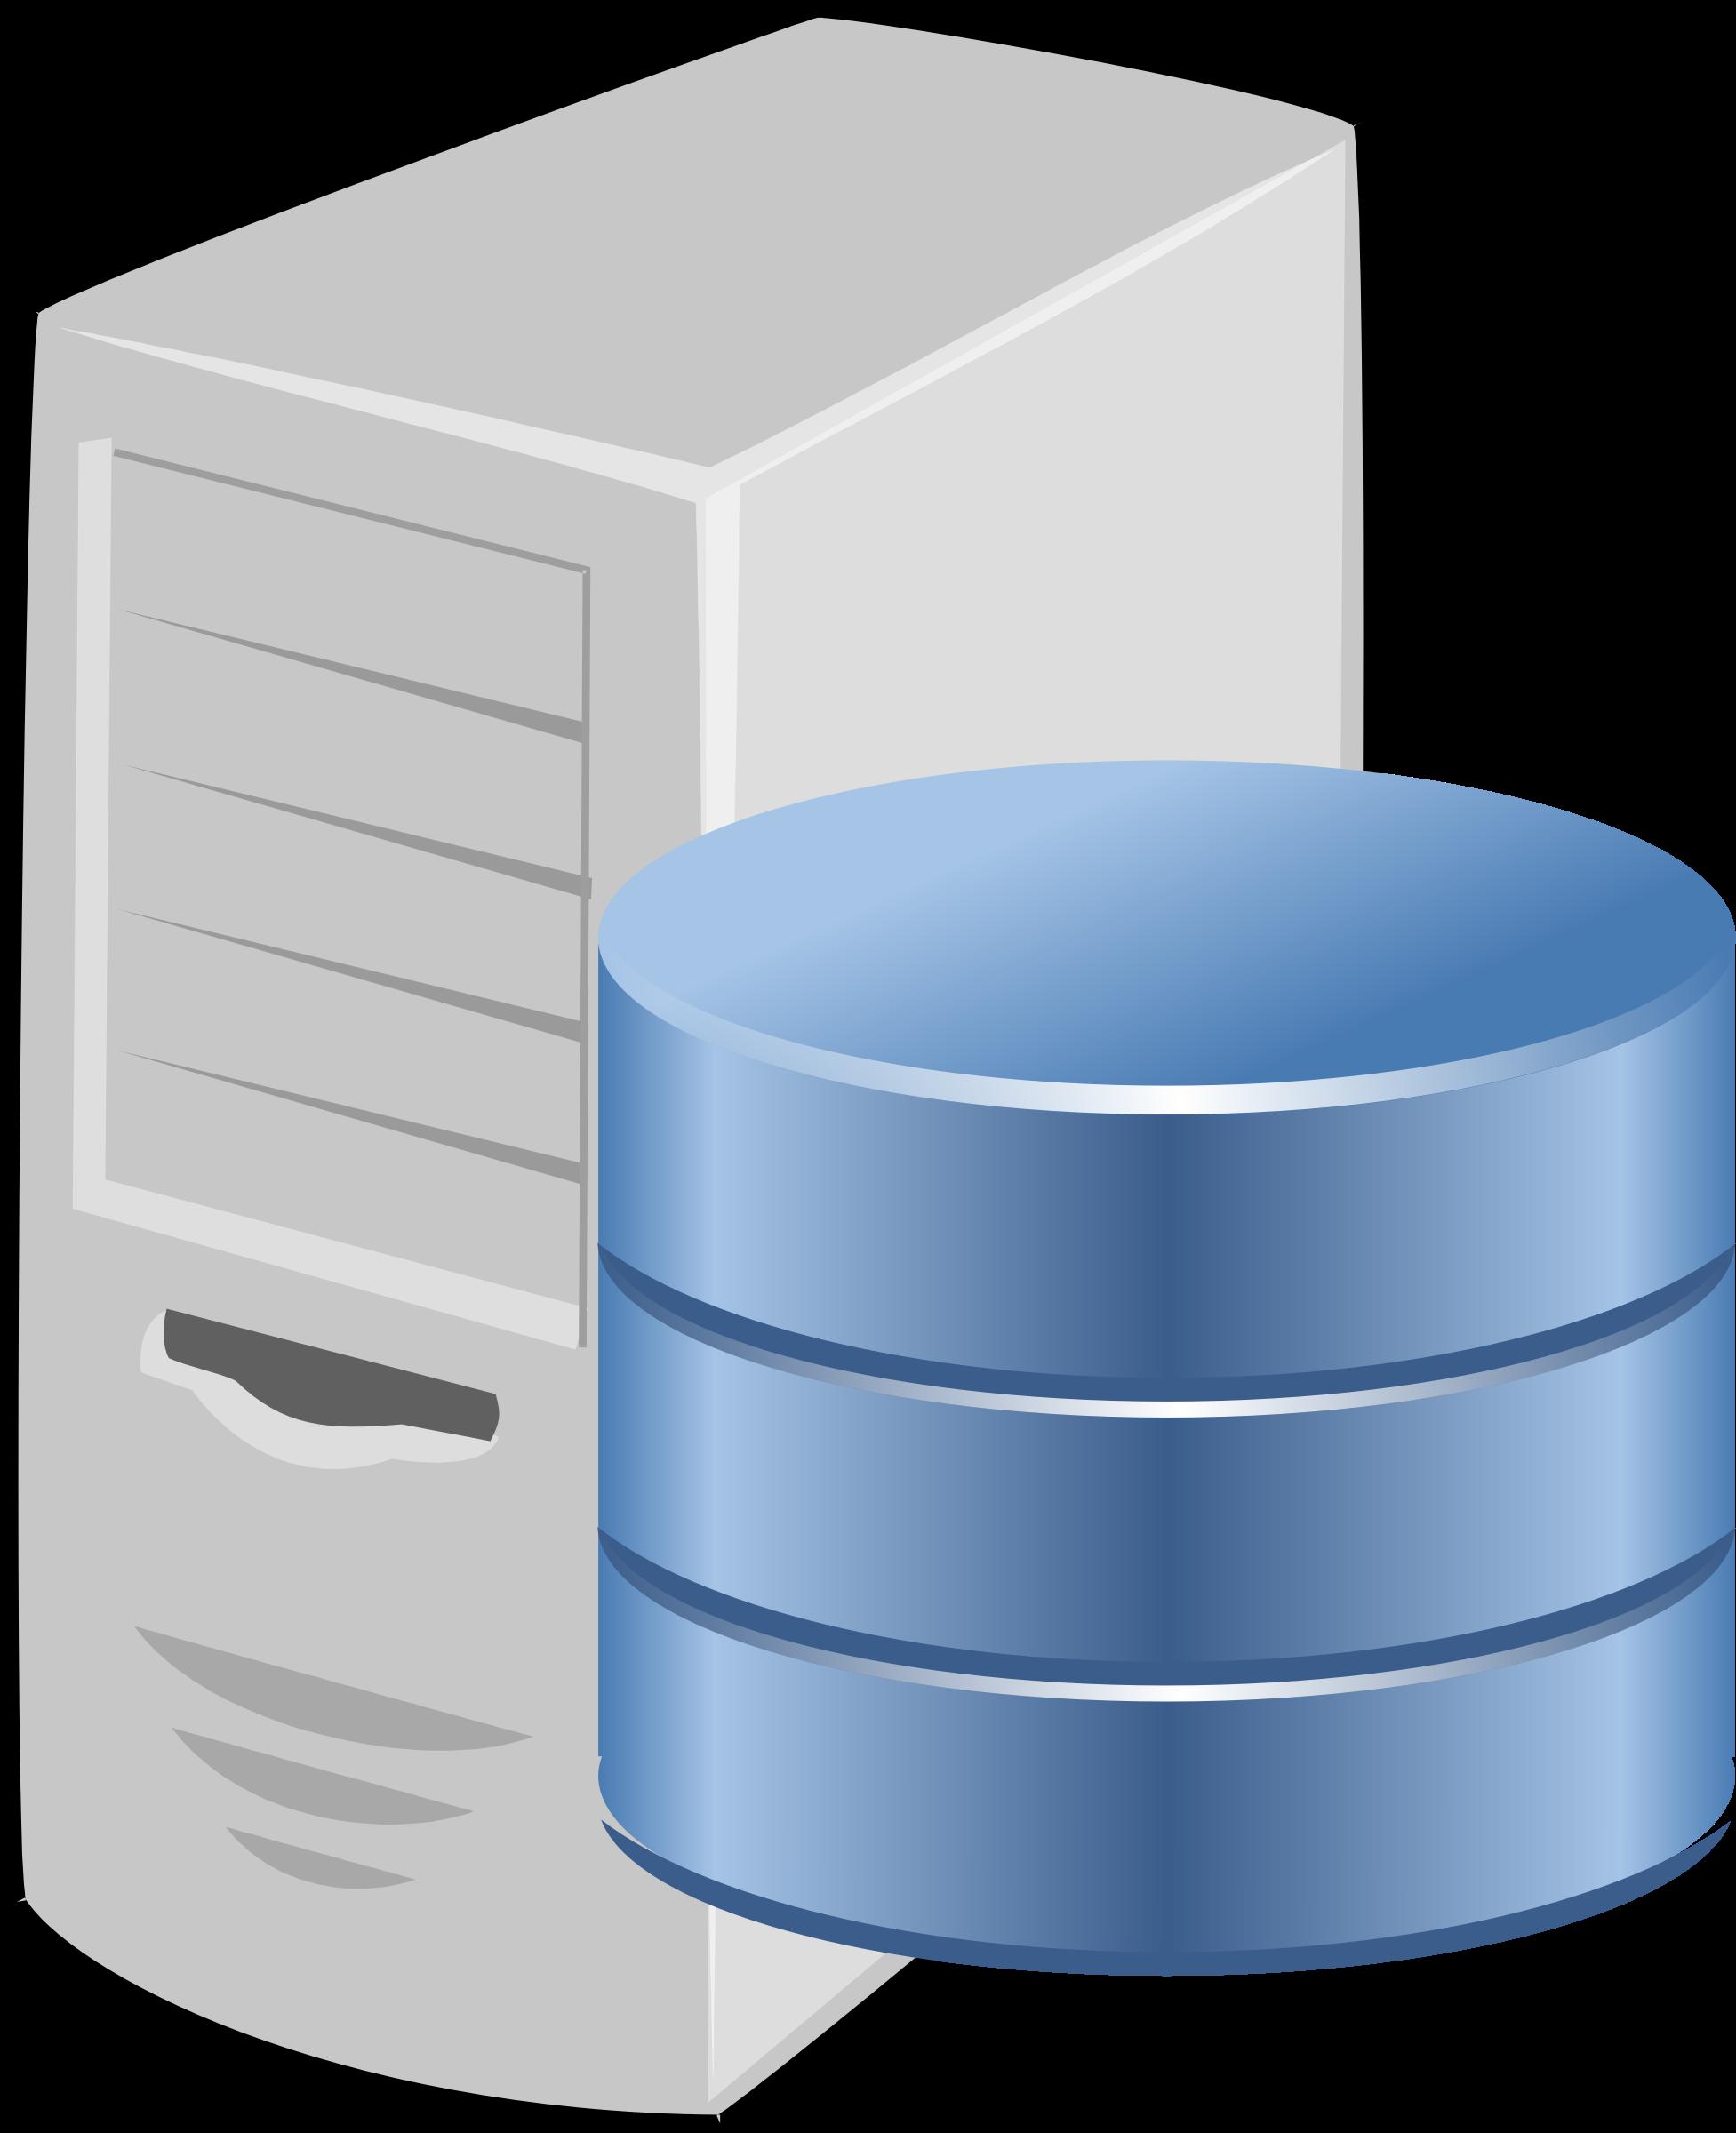 database server in 2020 Computer database, Dbms, Server